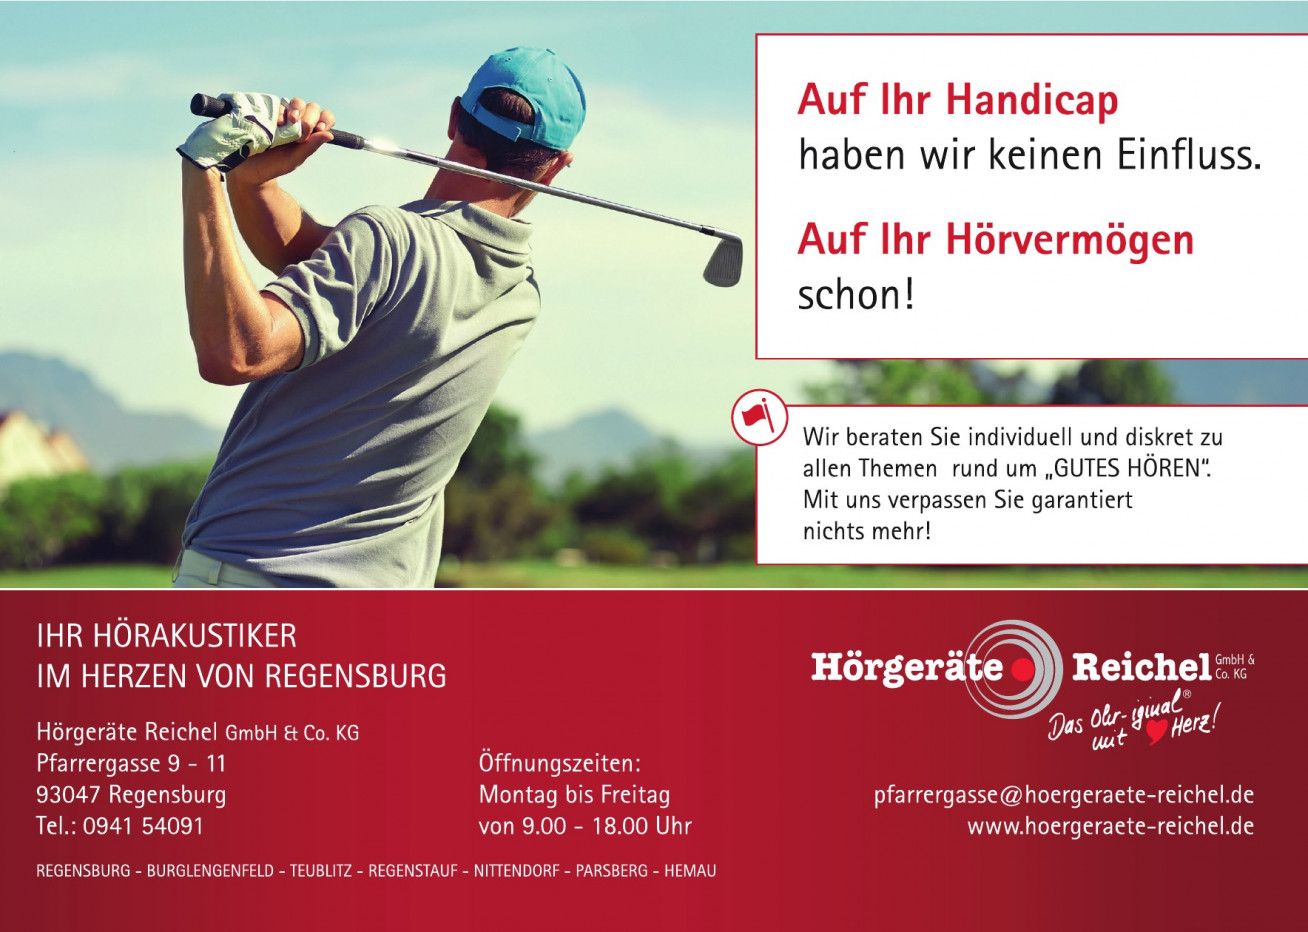 Hörgeräte Reichel GmbH & Co KG